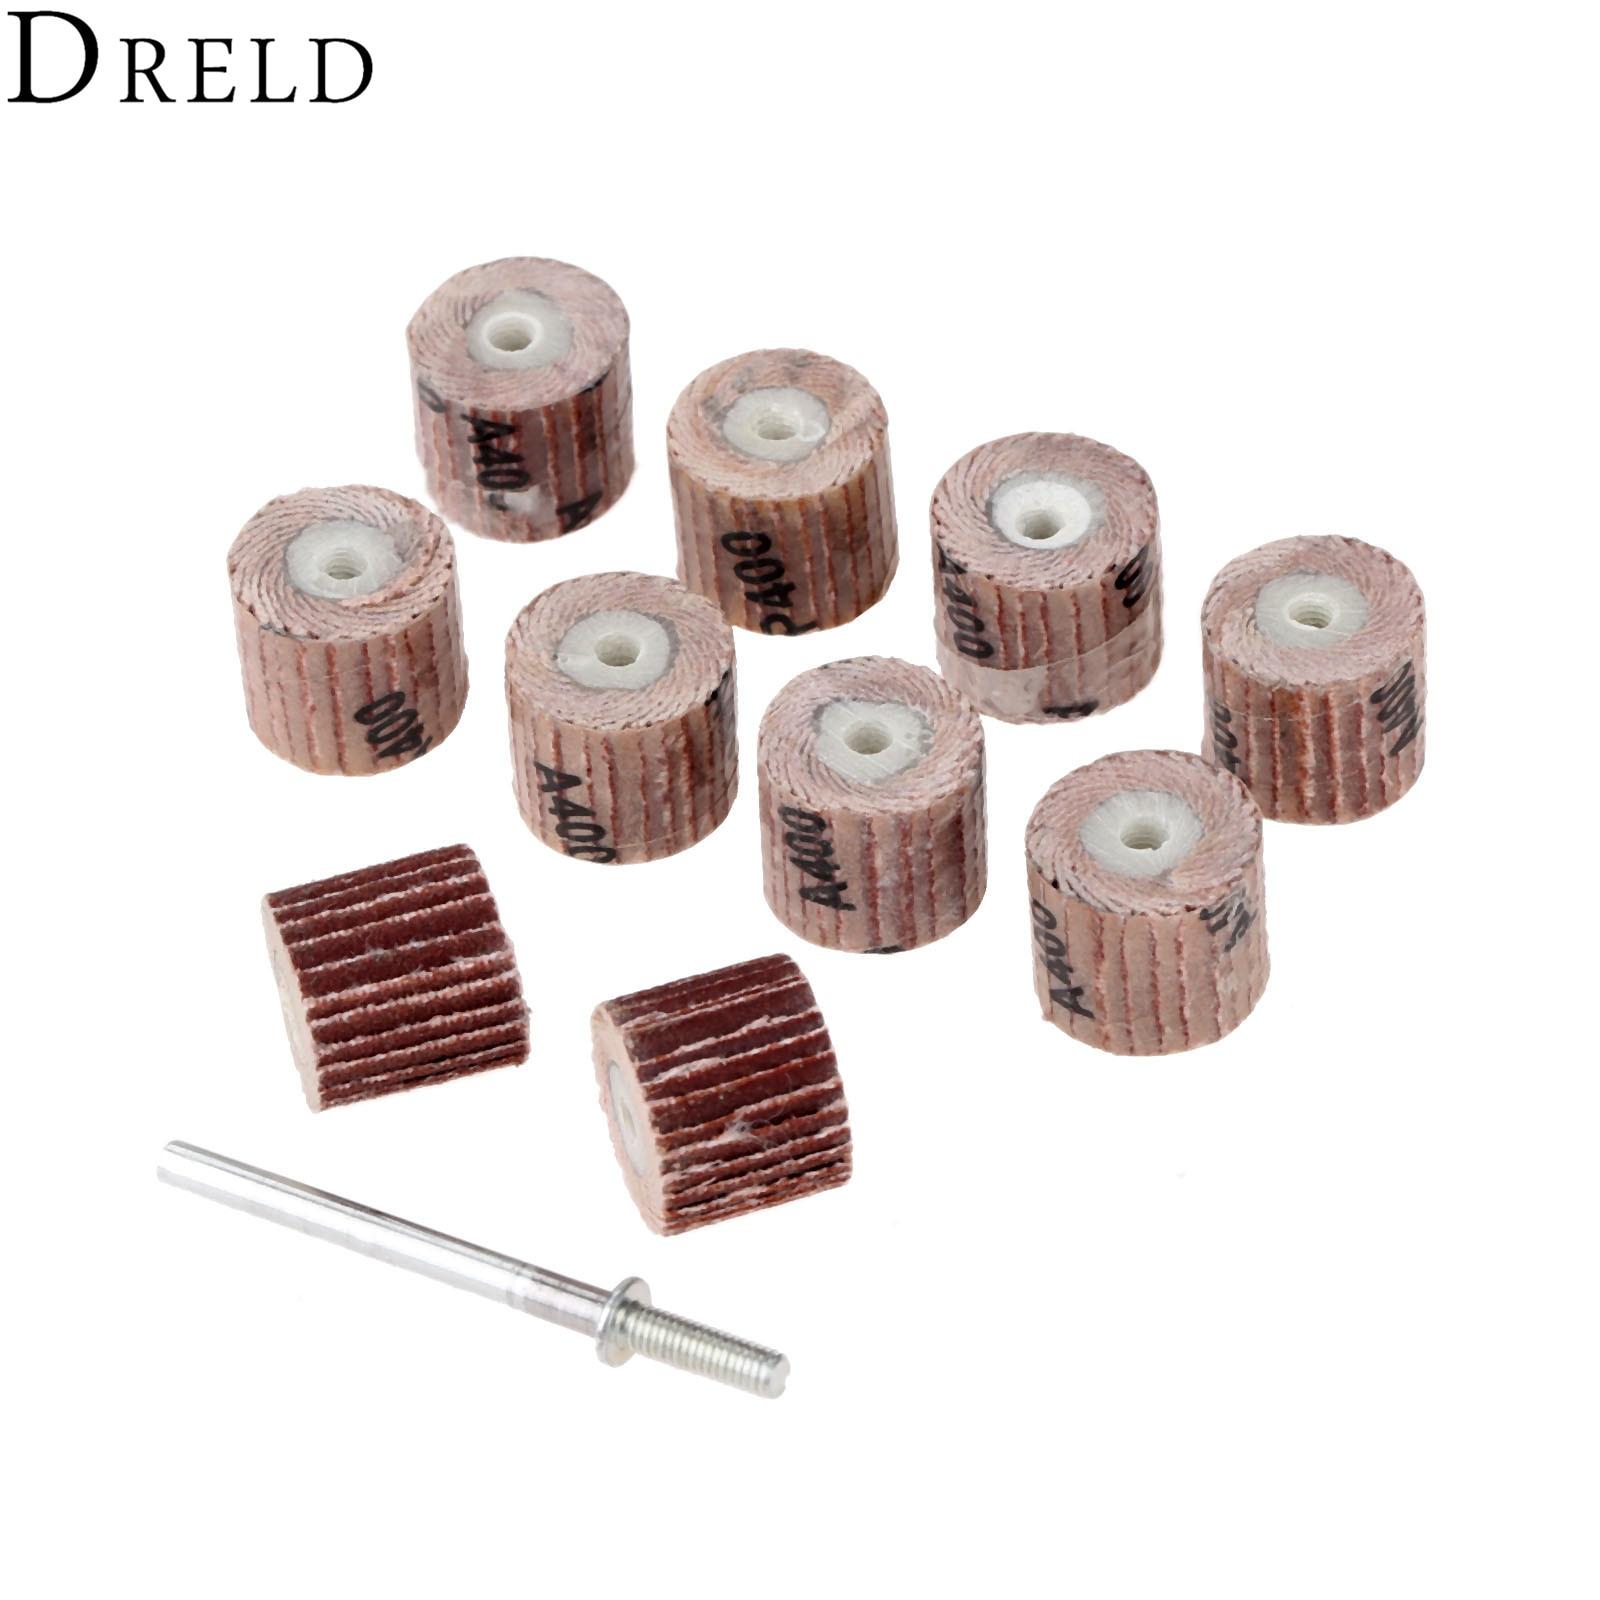 DRELD 10Pcs Dremel Accessories Sandpaper 12mm Grinding Sanindg Flap Wheel Brushes For Woodworking Disc With Mandrel 3mm Shank